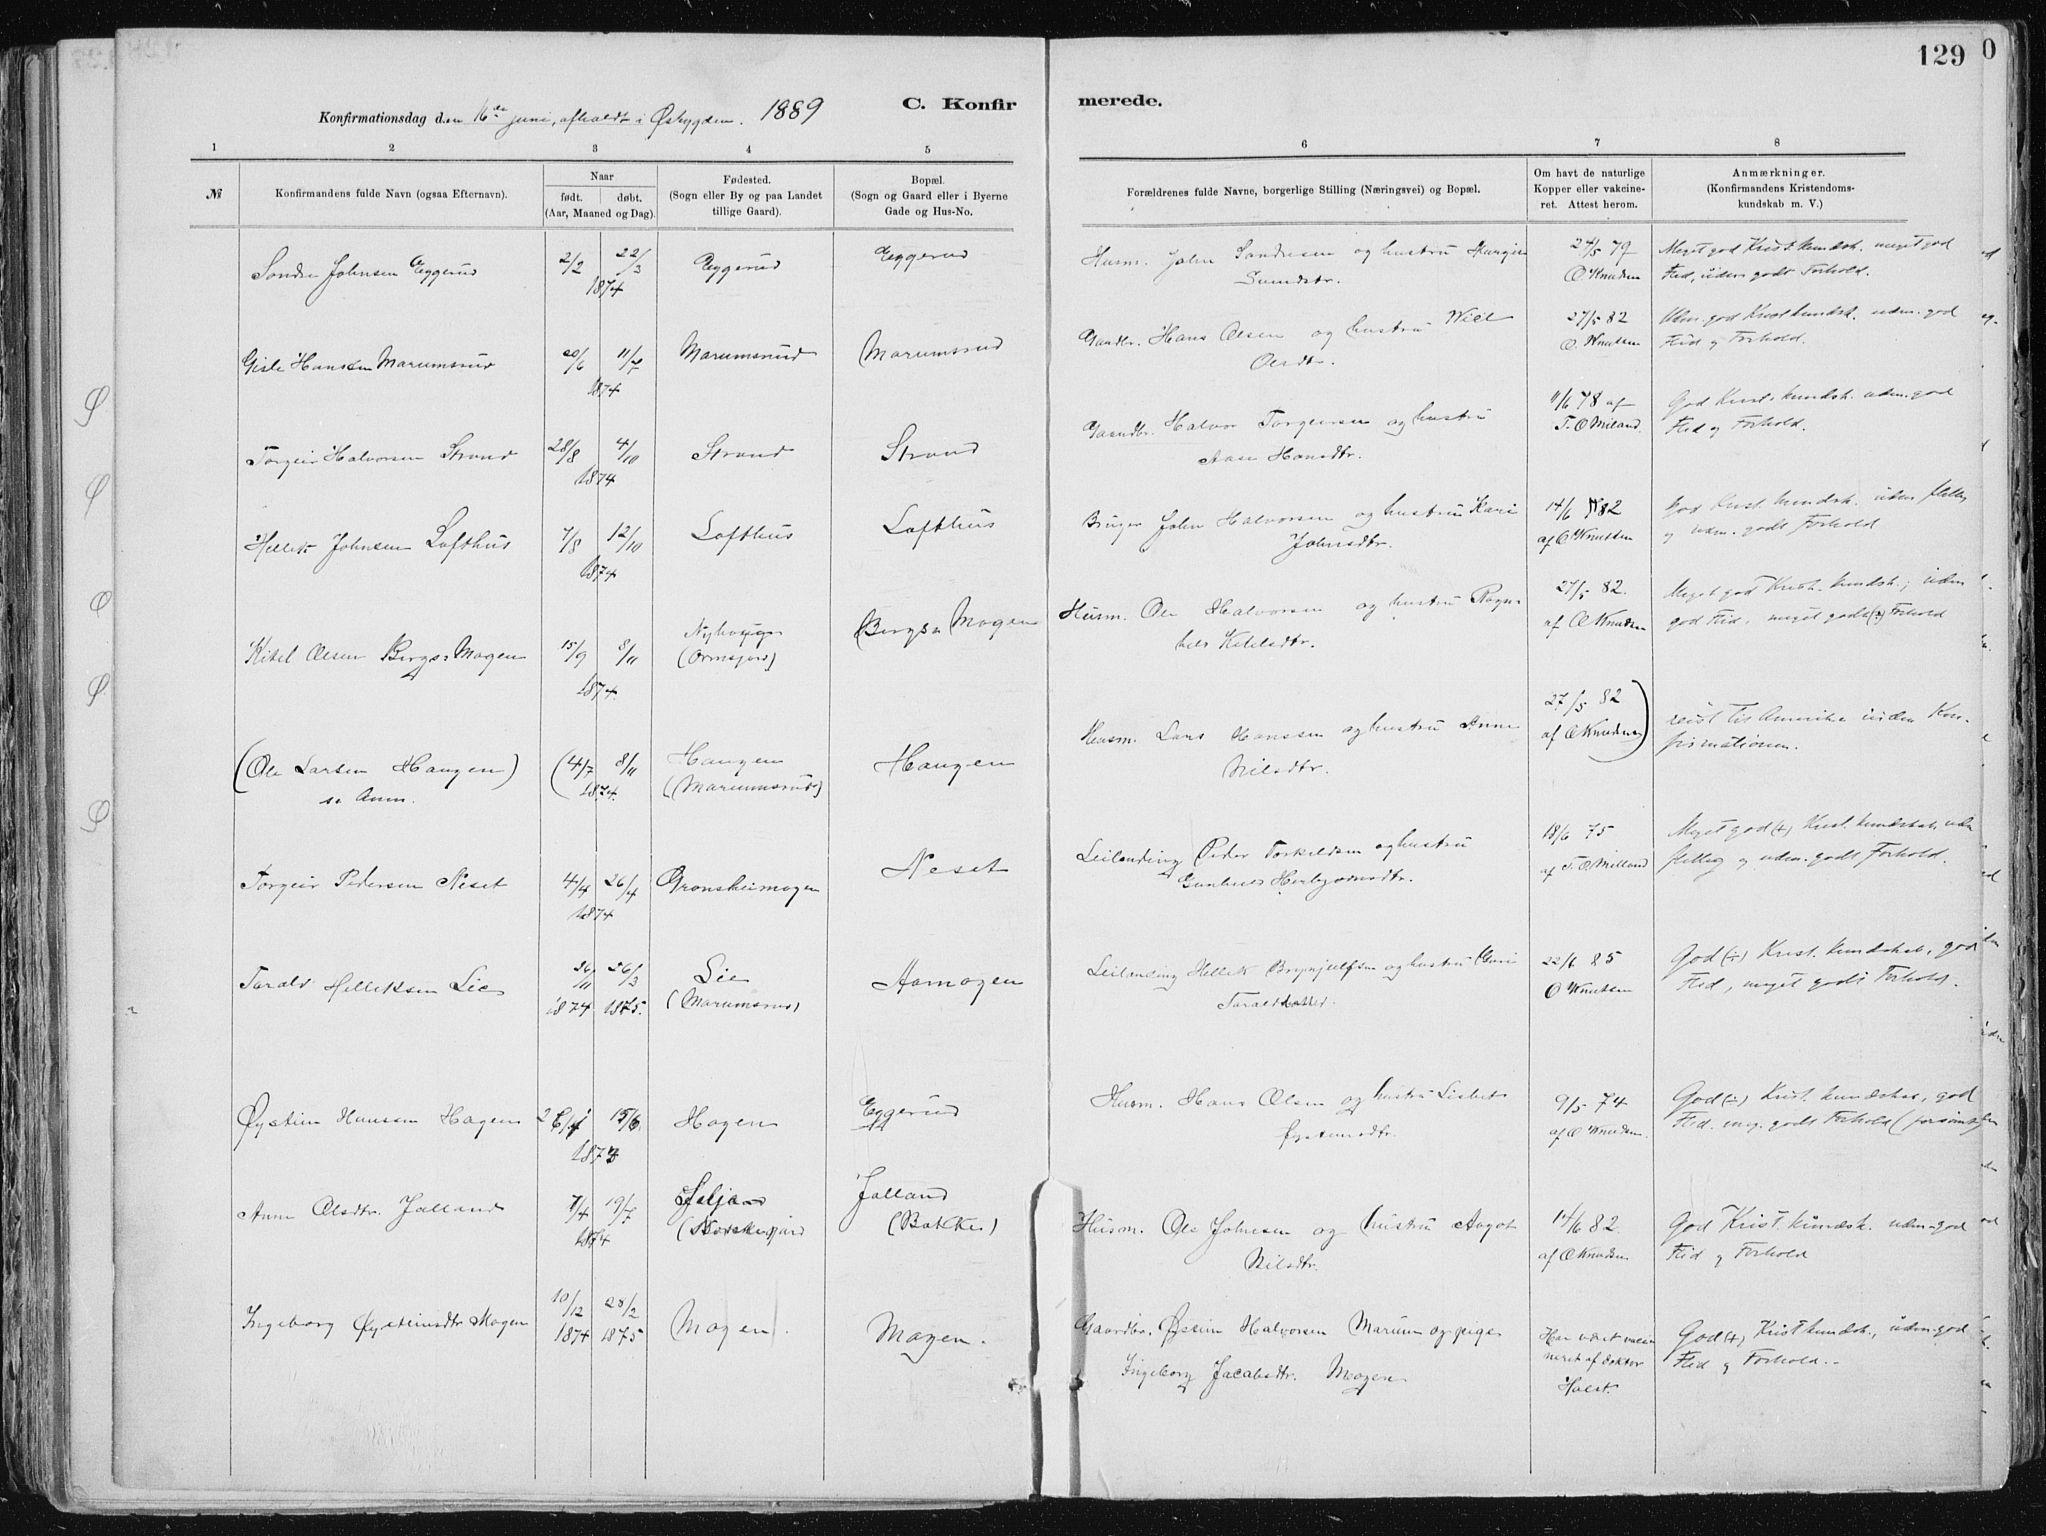 SAKO, Tinn kirkebøker, F/Fa/L0007: Ministerialbok nr. I 7, 1878-1922, s. 129